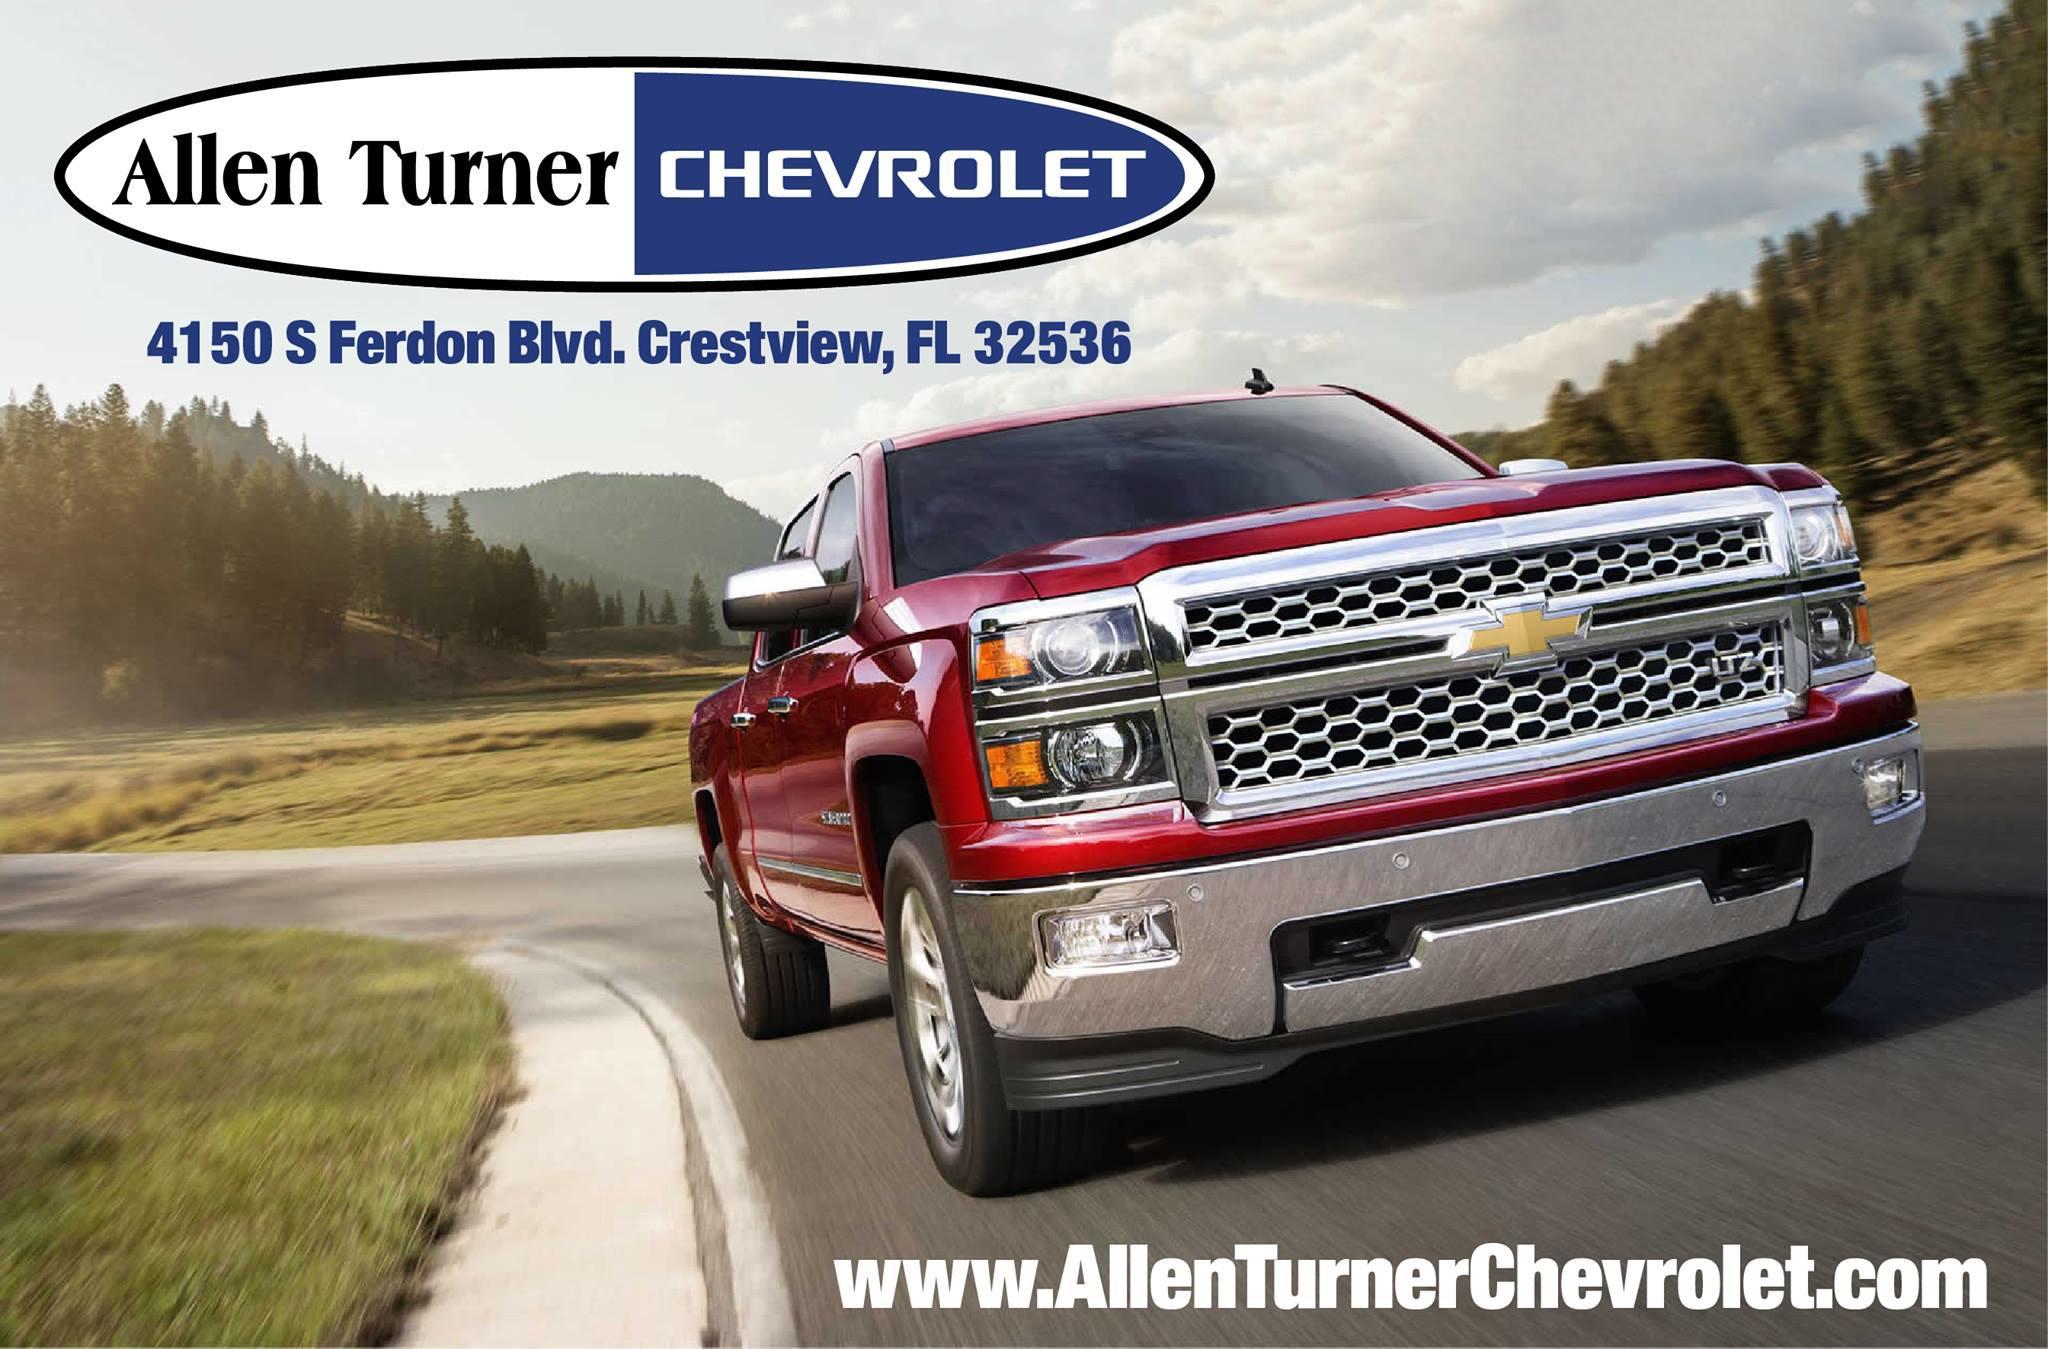 Allen Turner Used Cars Crestview